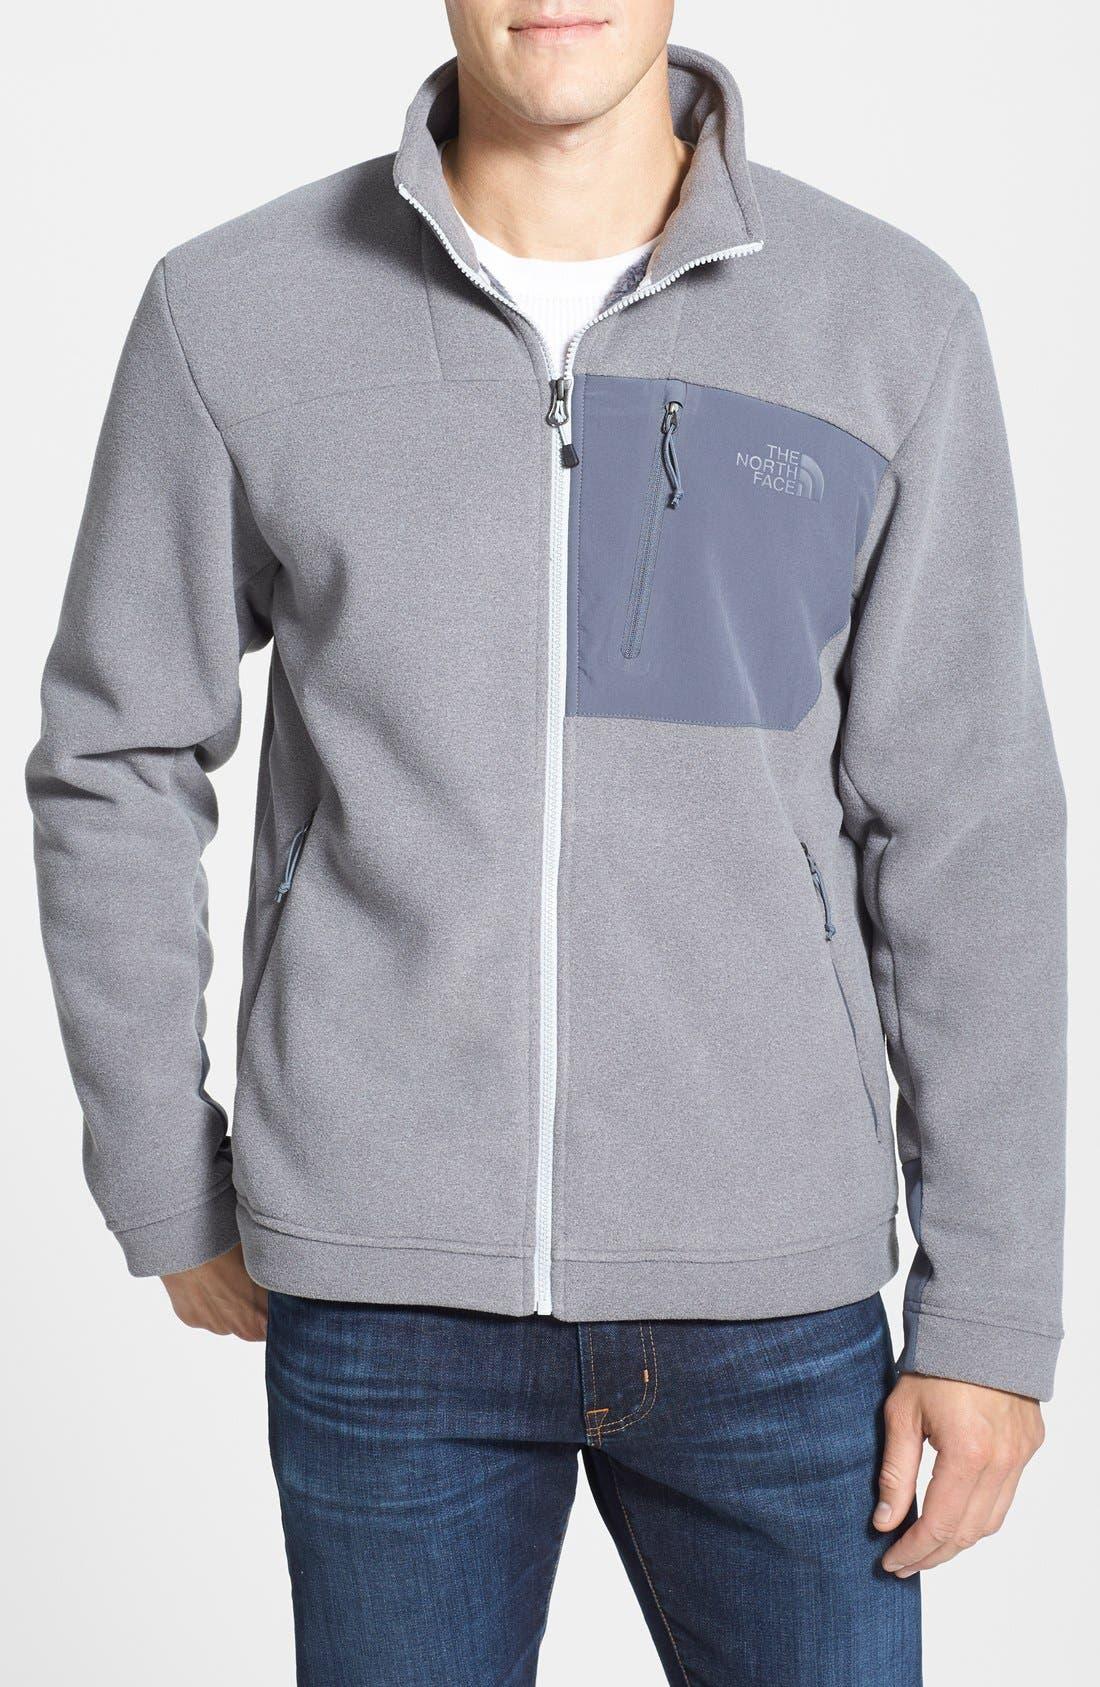 Main Image - The North Face 'Chimborazo' Zip Front Fleece Jacket